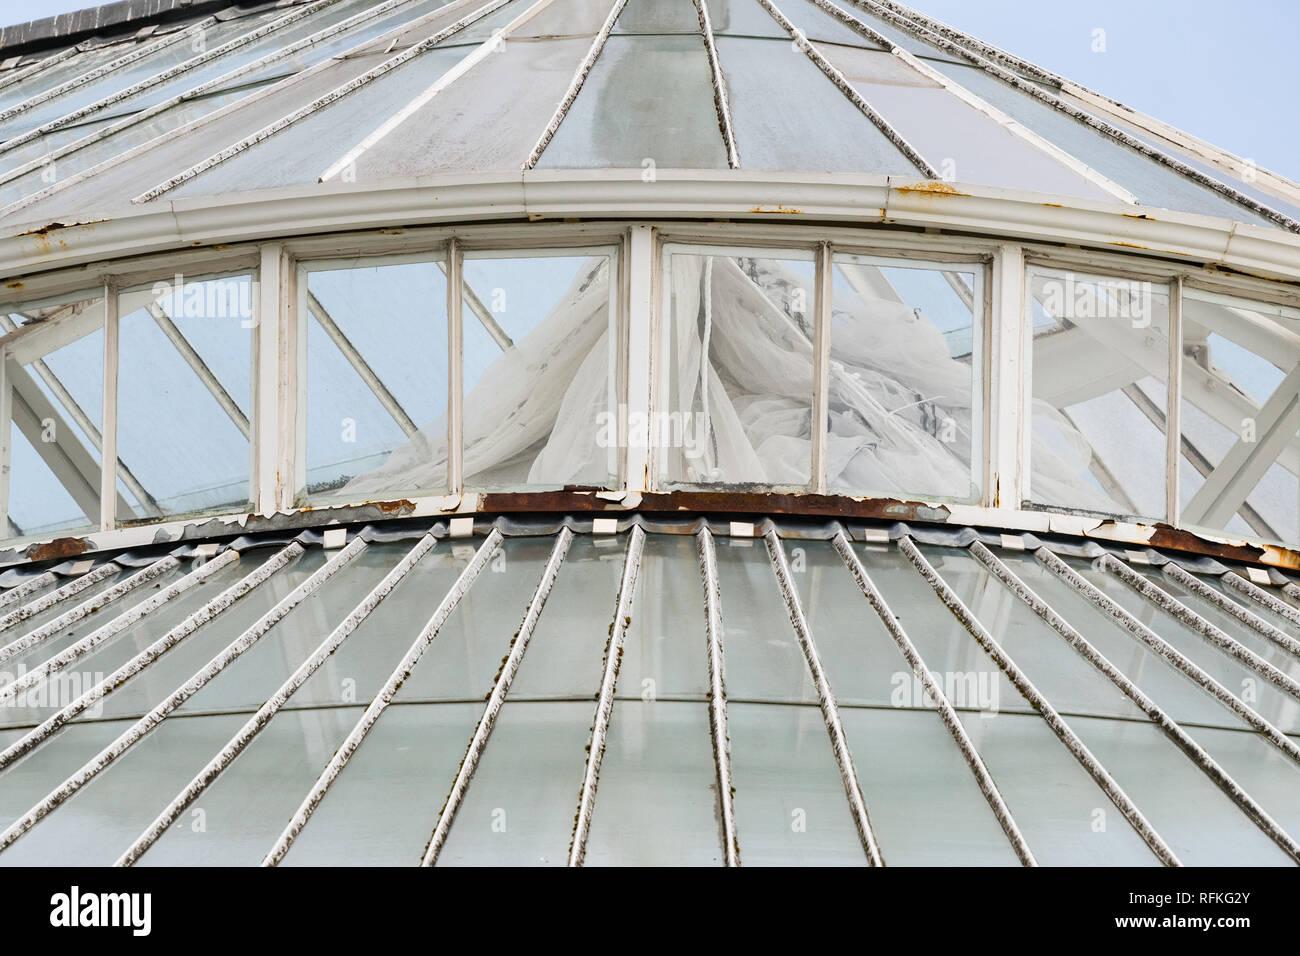 Glasgow winter gardens glasshouse in disrepair shortly after closure, Glasgow Green, Glasgow, scotland, UK - Stock Image